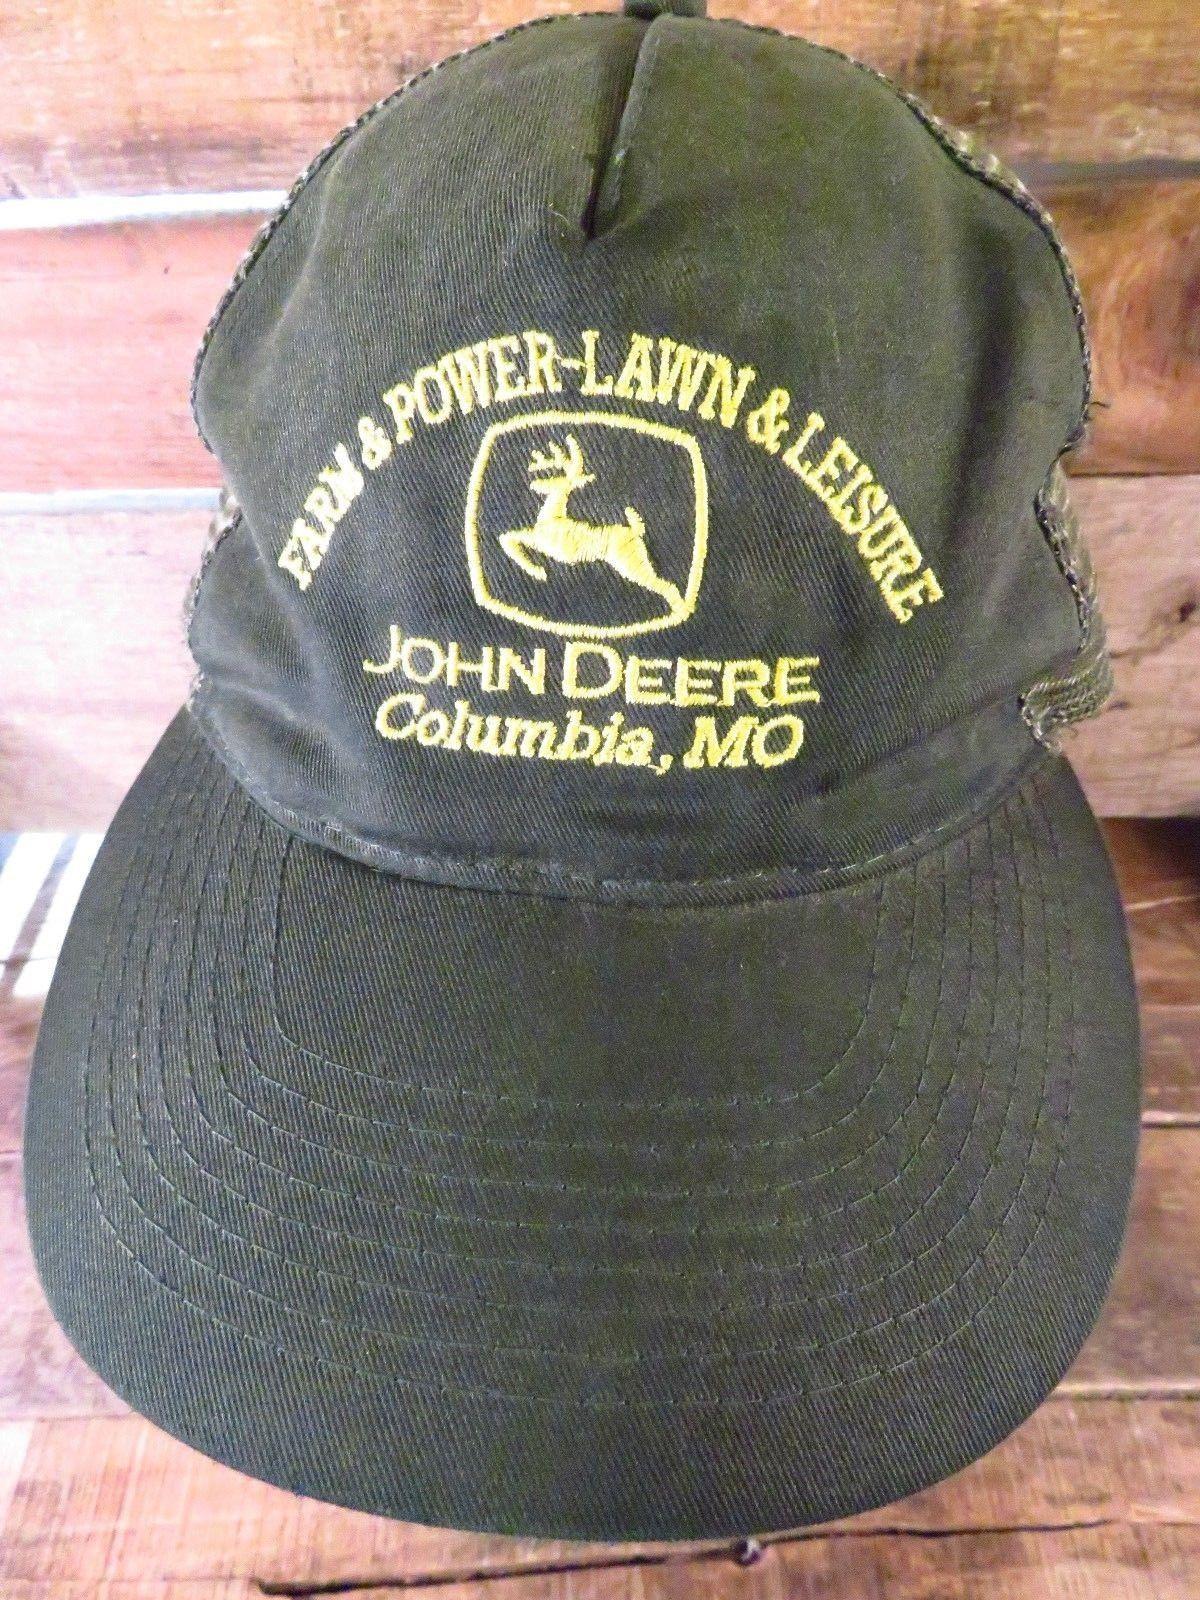 7eaa117b3c701 JOHN DEERE Columbia MO Farm Power Lawn Leisure Adjustable Adult Hat Cap